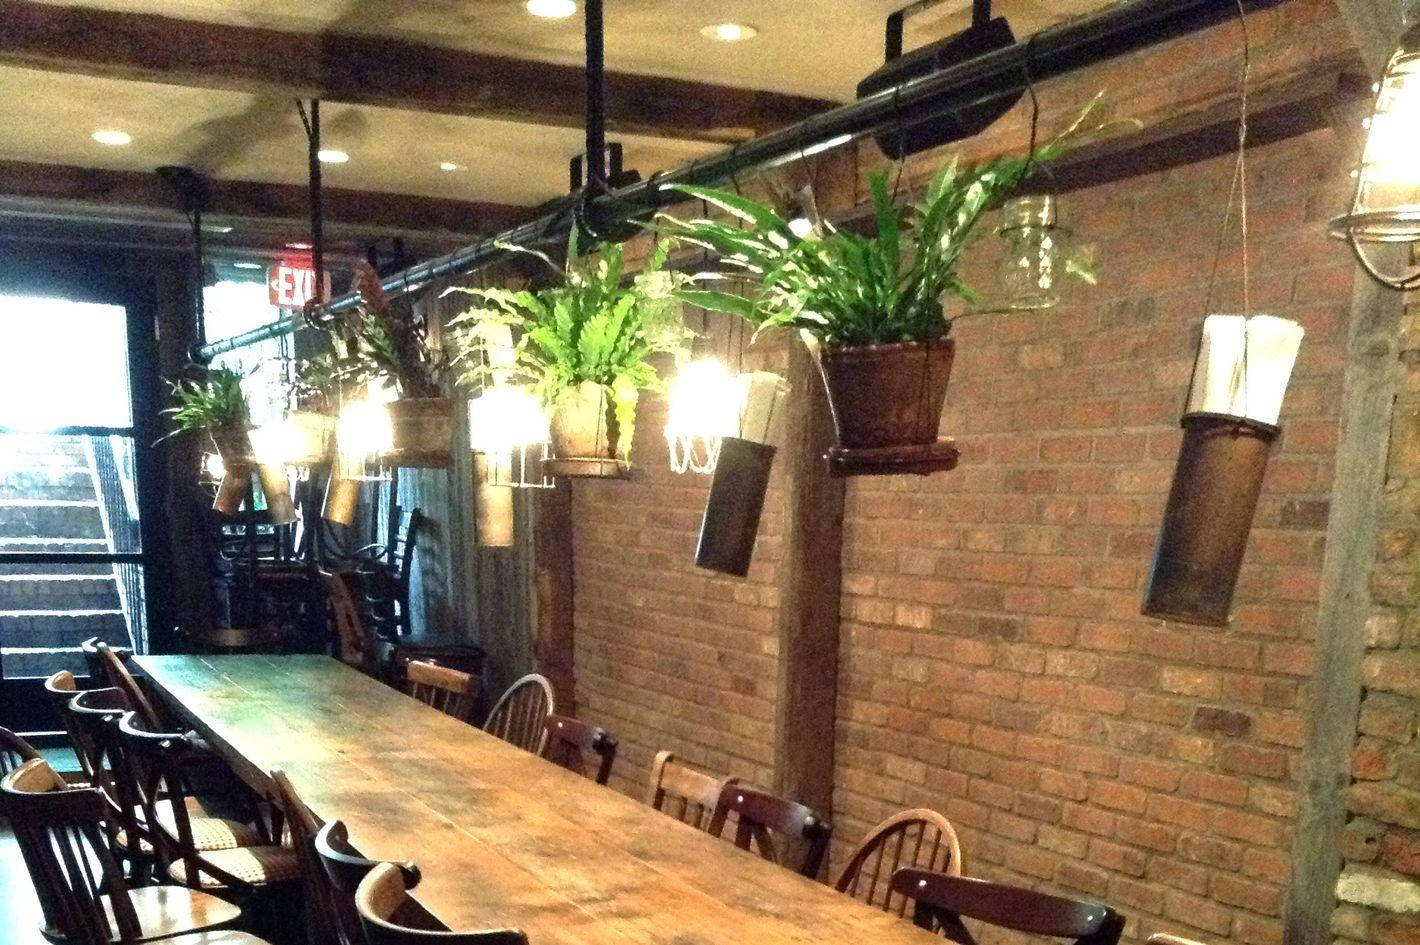 "Crème, Schoenfeld's designer, gave Grub a <a href=""http://www.grubstreet.com/2013/09/new-york-restaurant-designers-to-watch.html"">sneak peek</a> at the space."